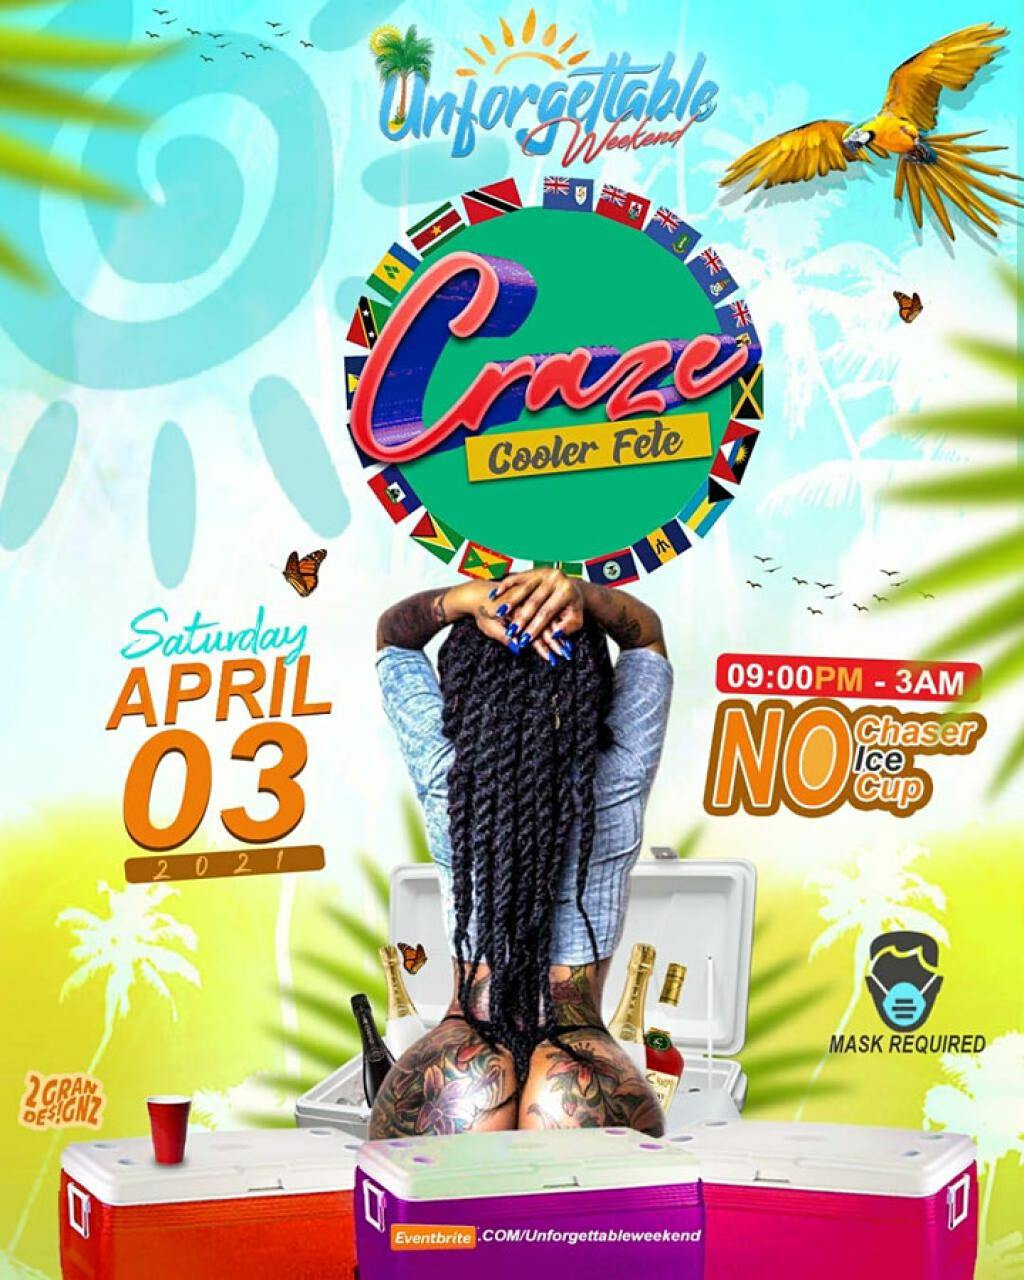 Unforgettable Weekend - Craze Cooler Fete flyer or graphic.